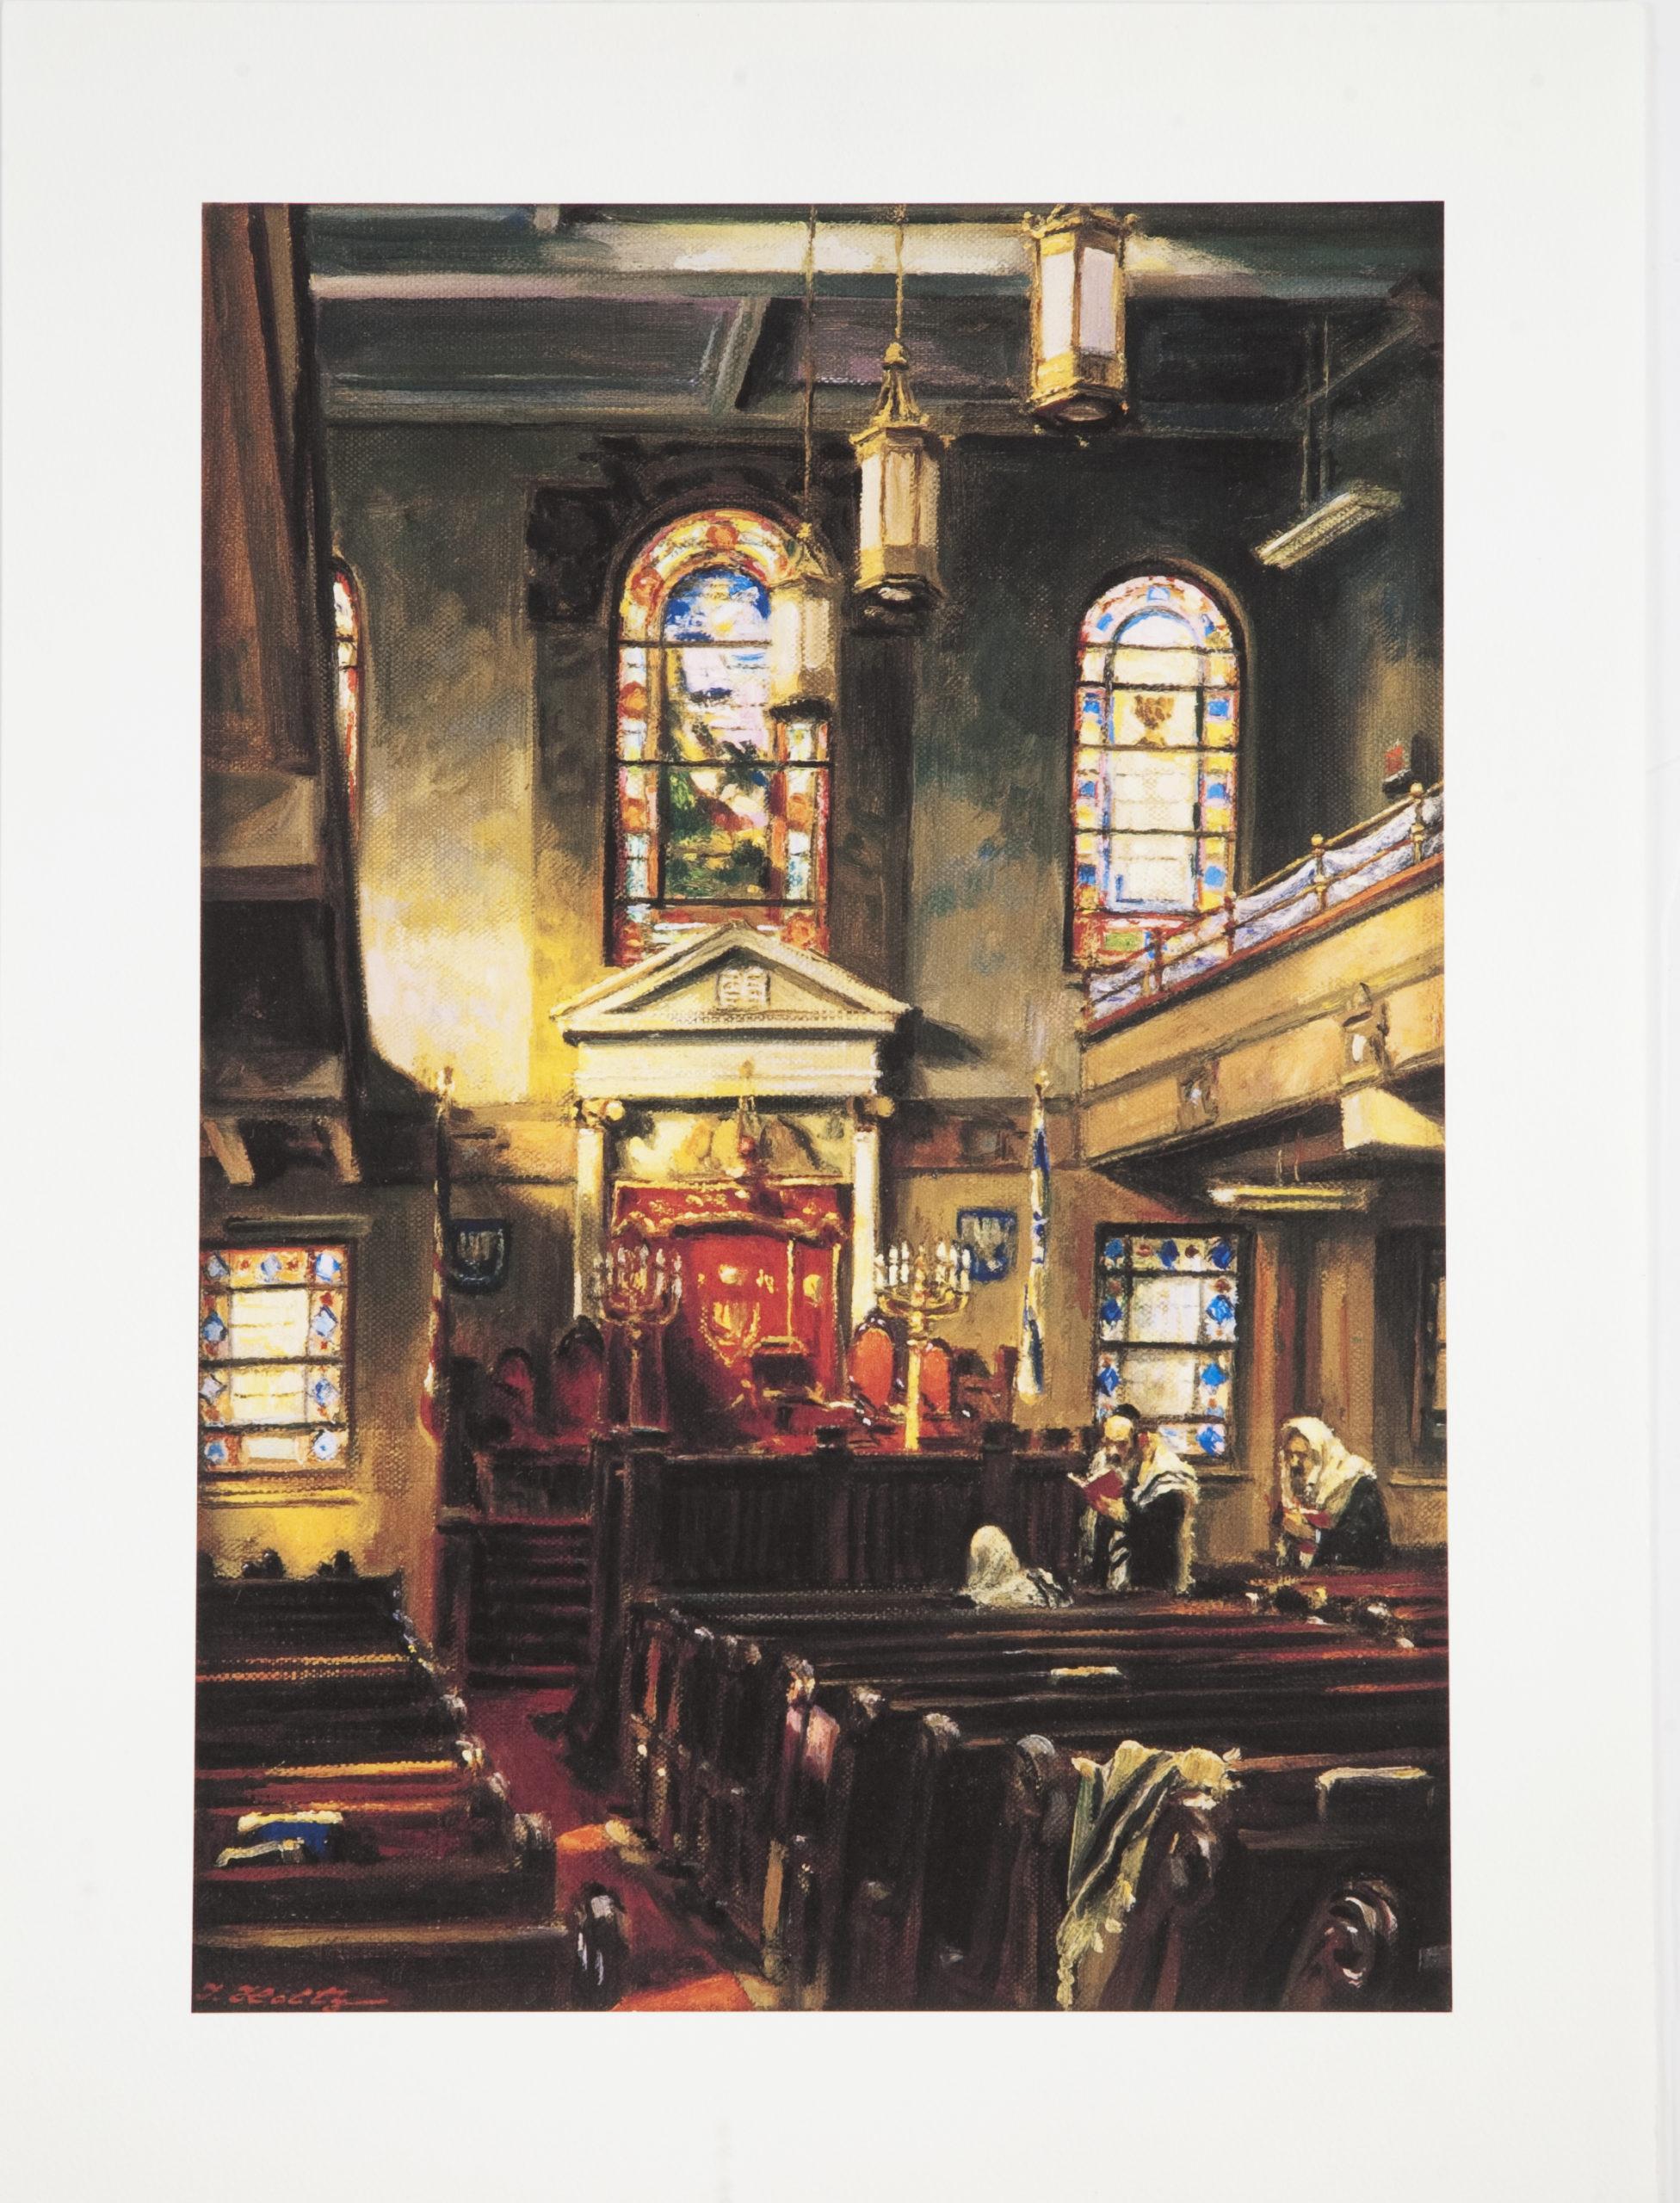 L13 Washington Heights Synagogue 1970 - Color - Lithograph - 22 x 16.25 - No Frame- $500